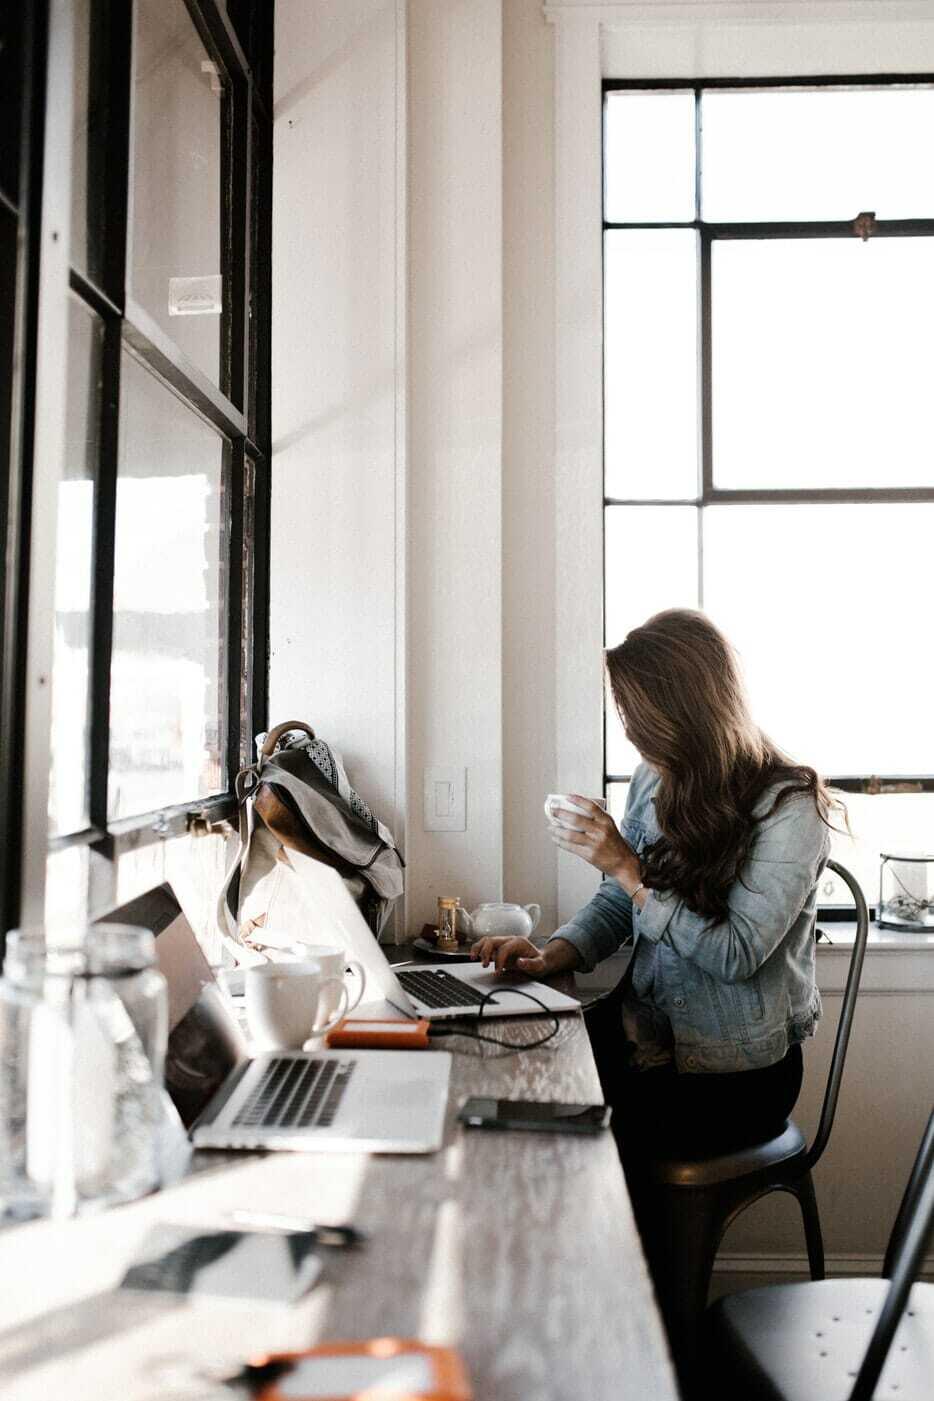 Women at Computer Digital Marketing COVID-19 Strategy